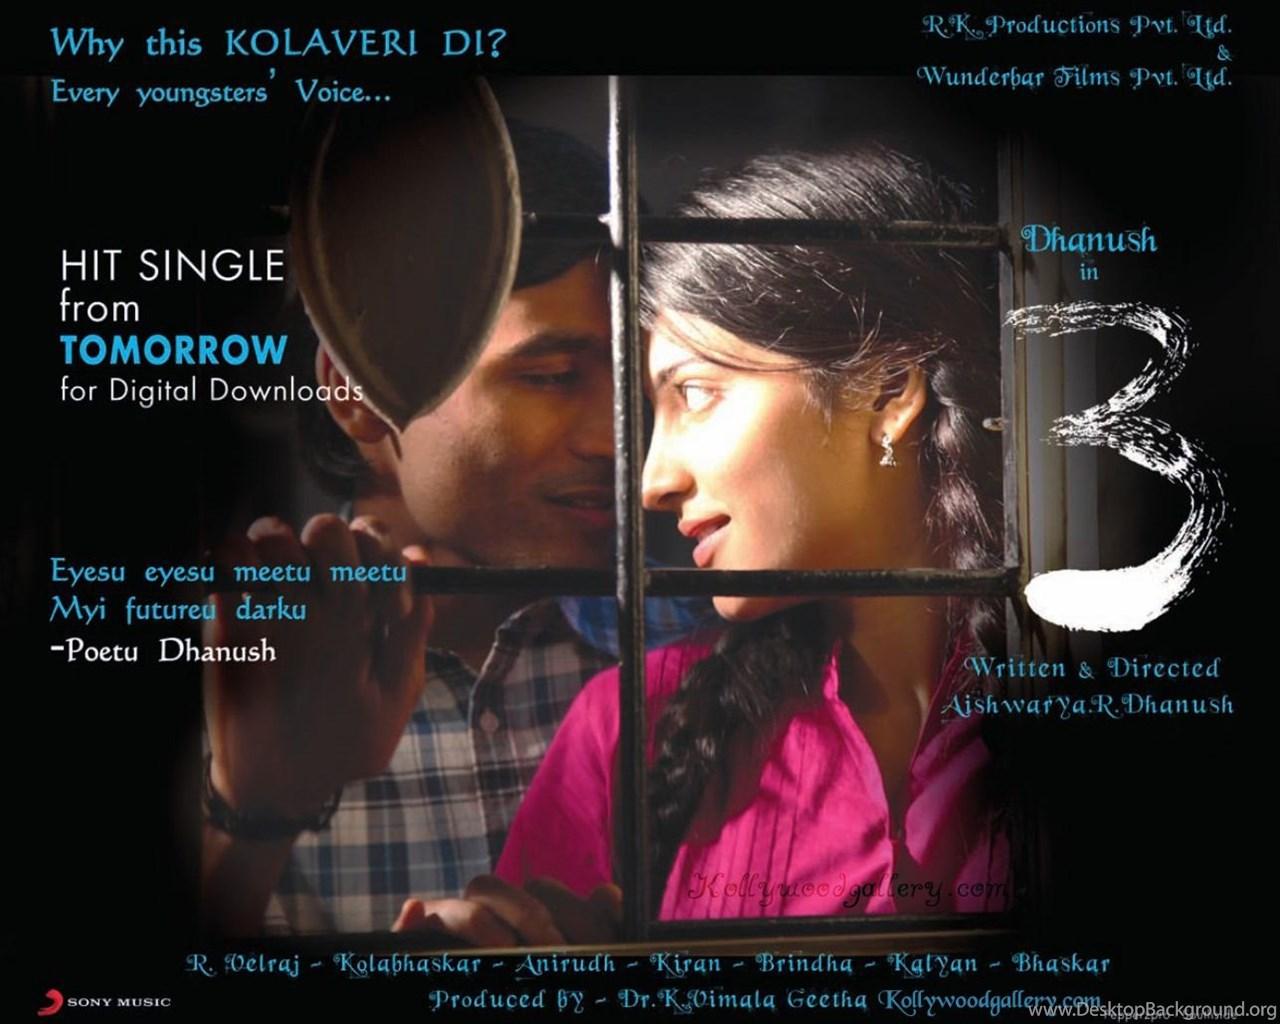 mashababko: 3 wallpapers tamil movie desktop background